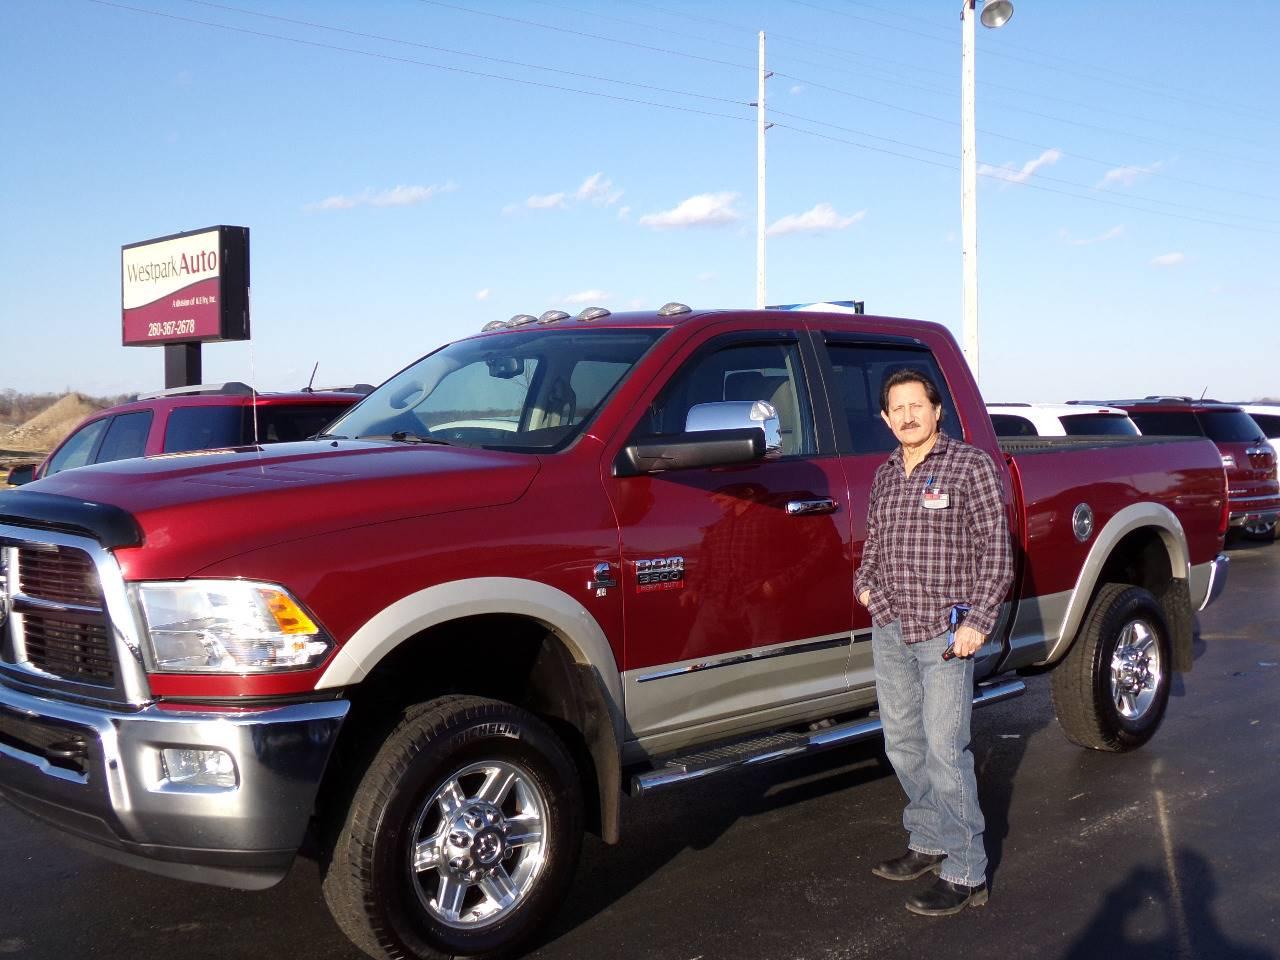 Livermore Ford Service >> Customer Testimonials - WestPark Auto Lagrange IN